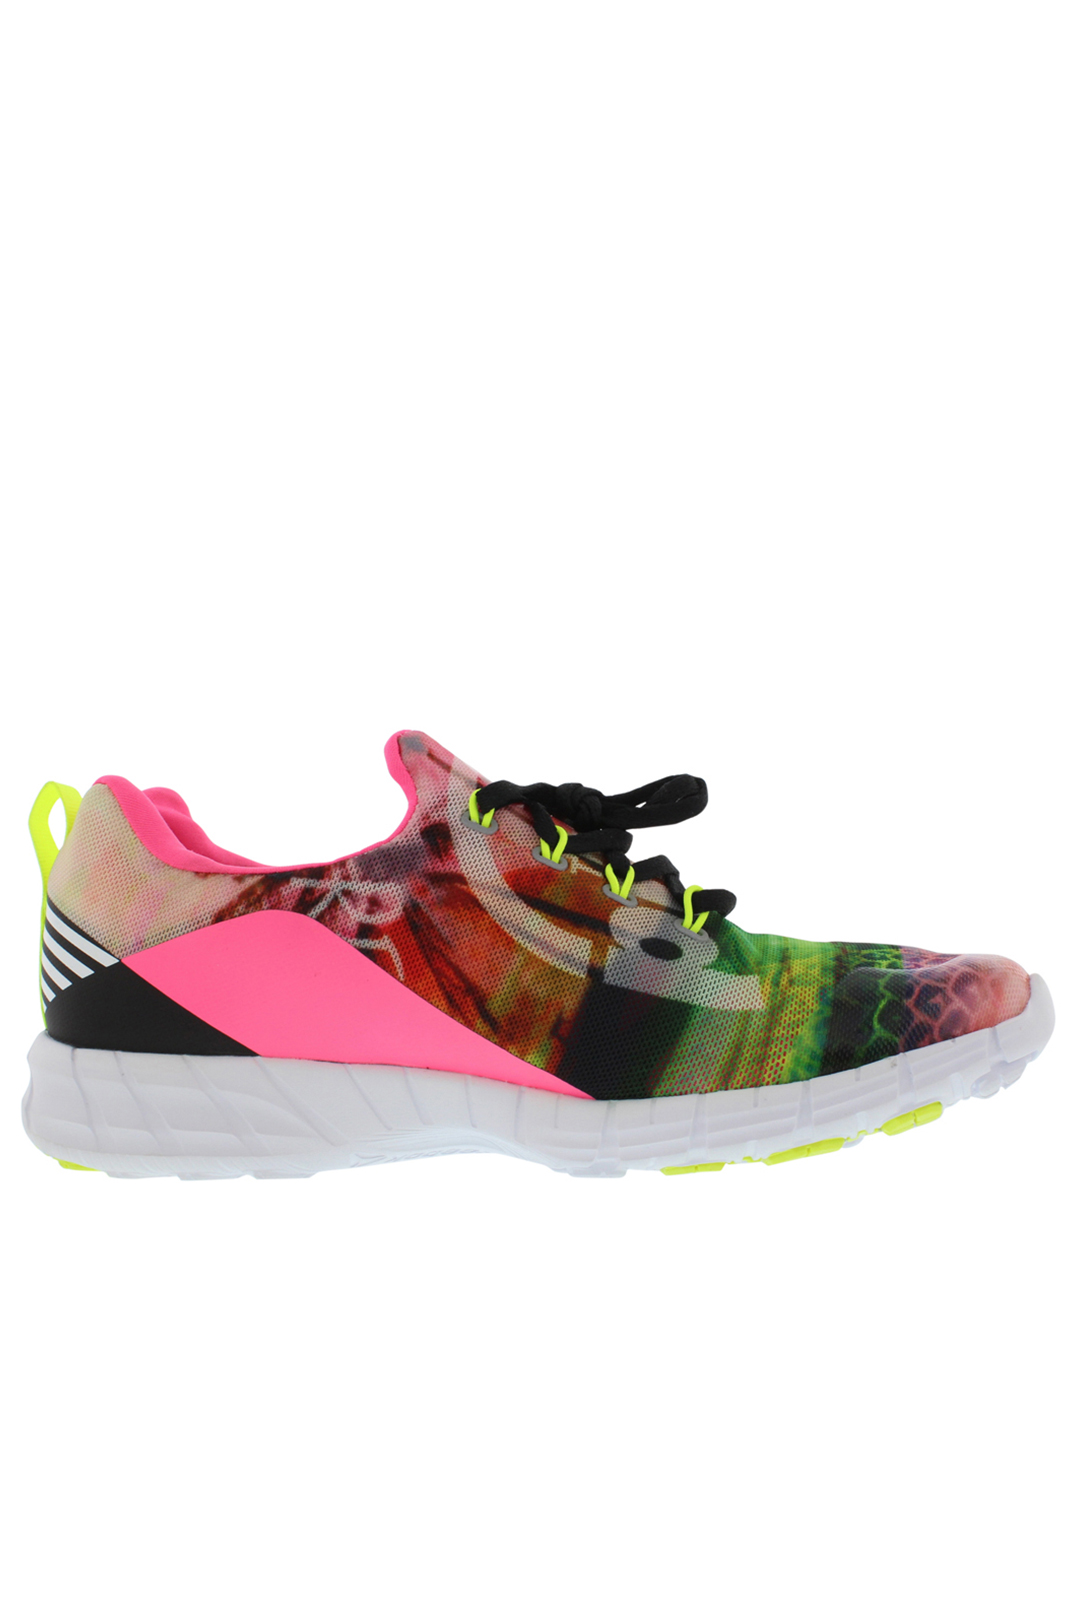 Baskets / Sneakers  Reebok V72617 ZPUMPFUSION MULTI